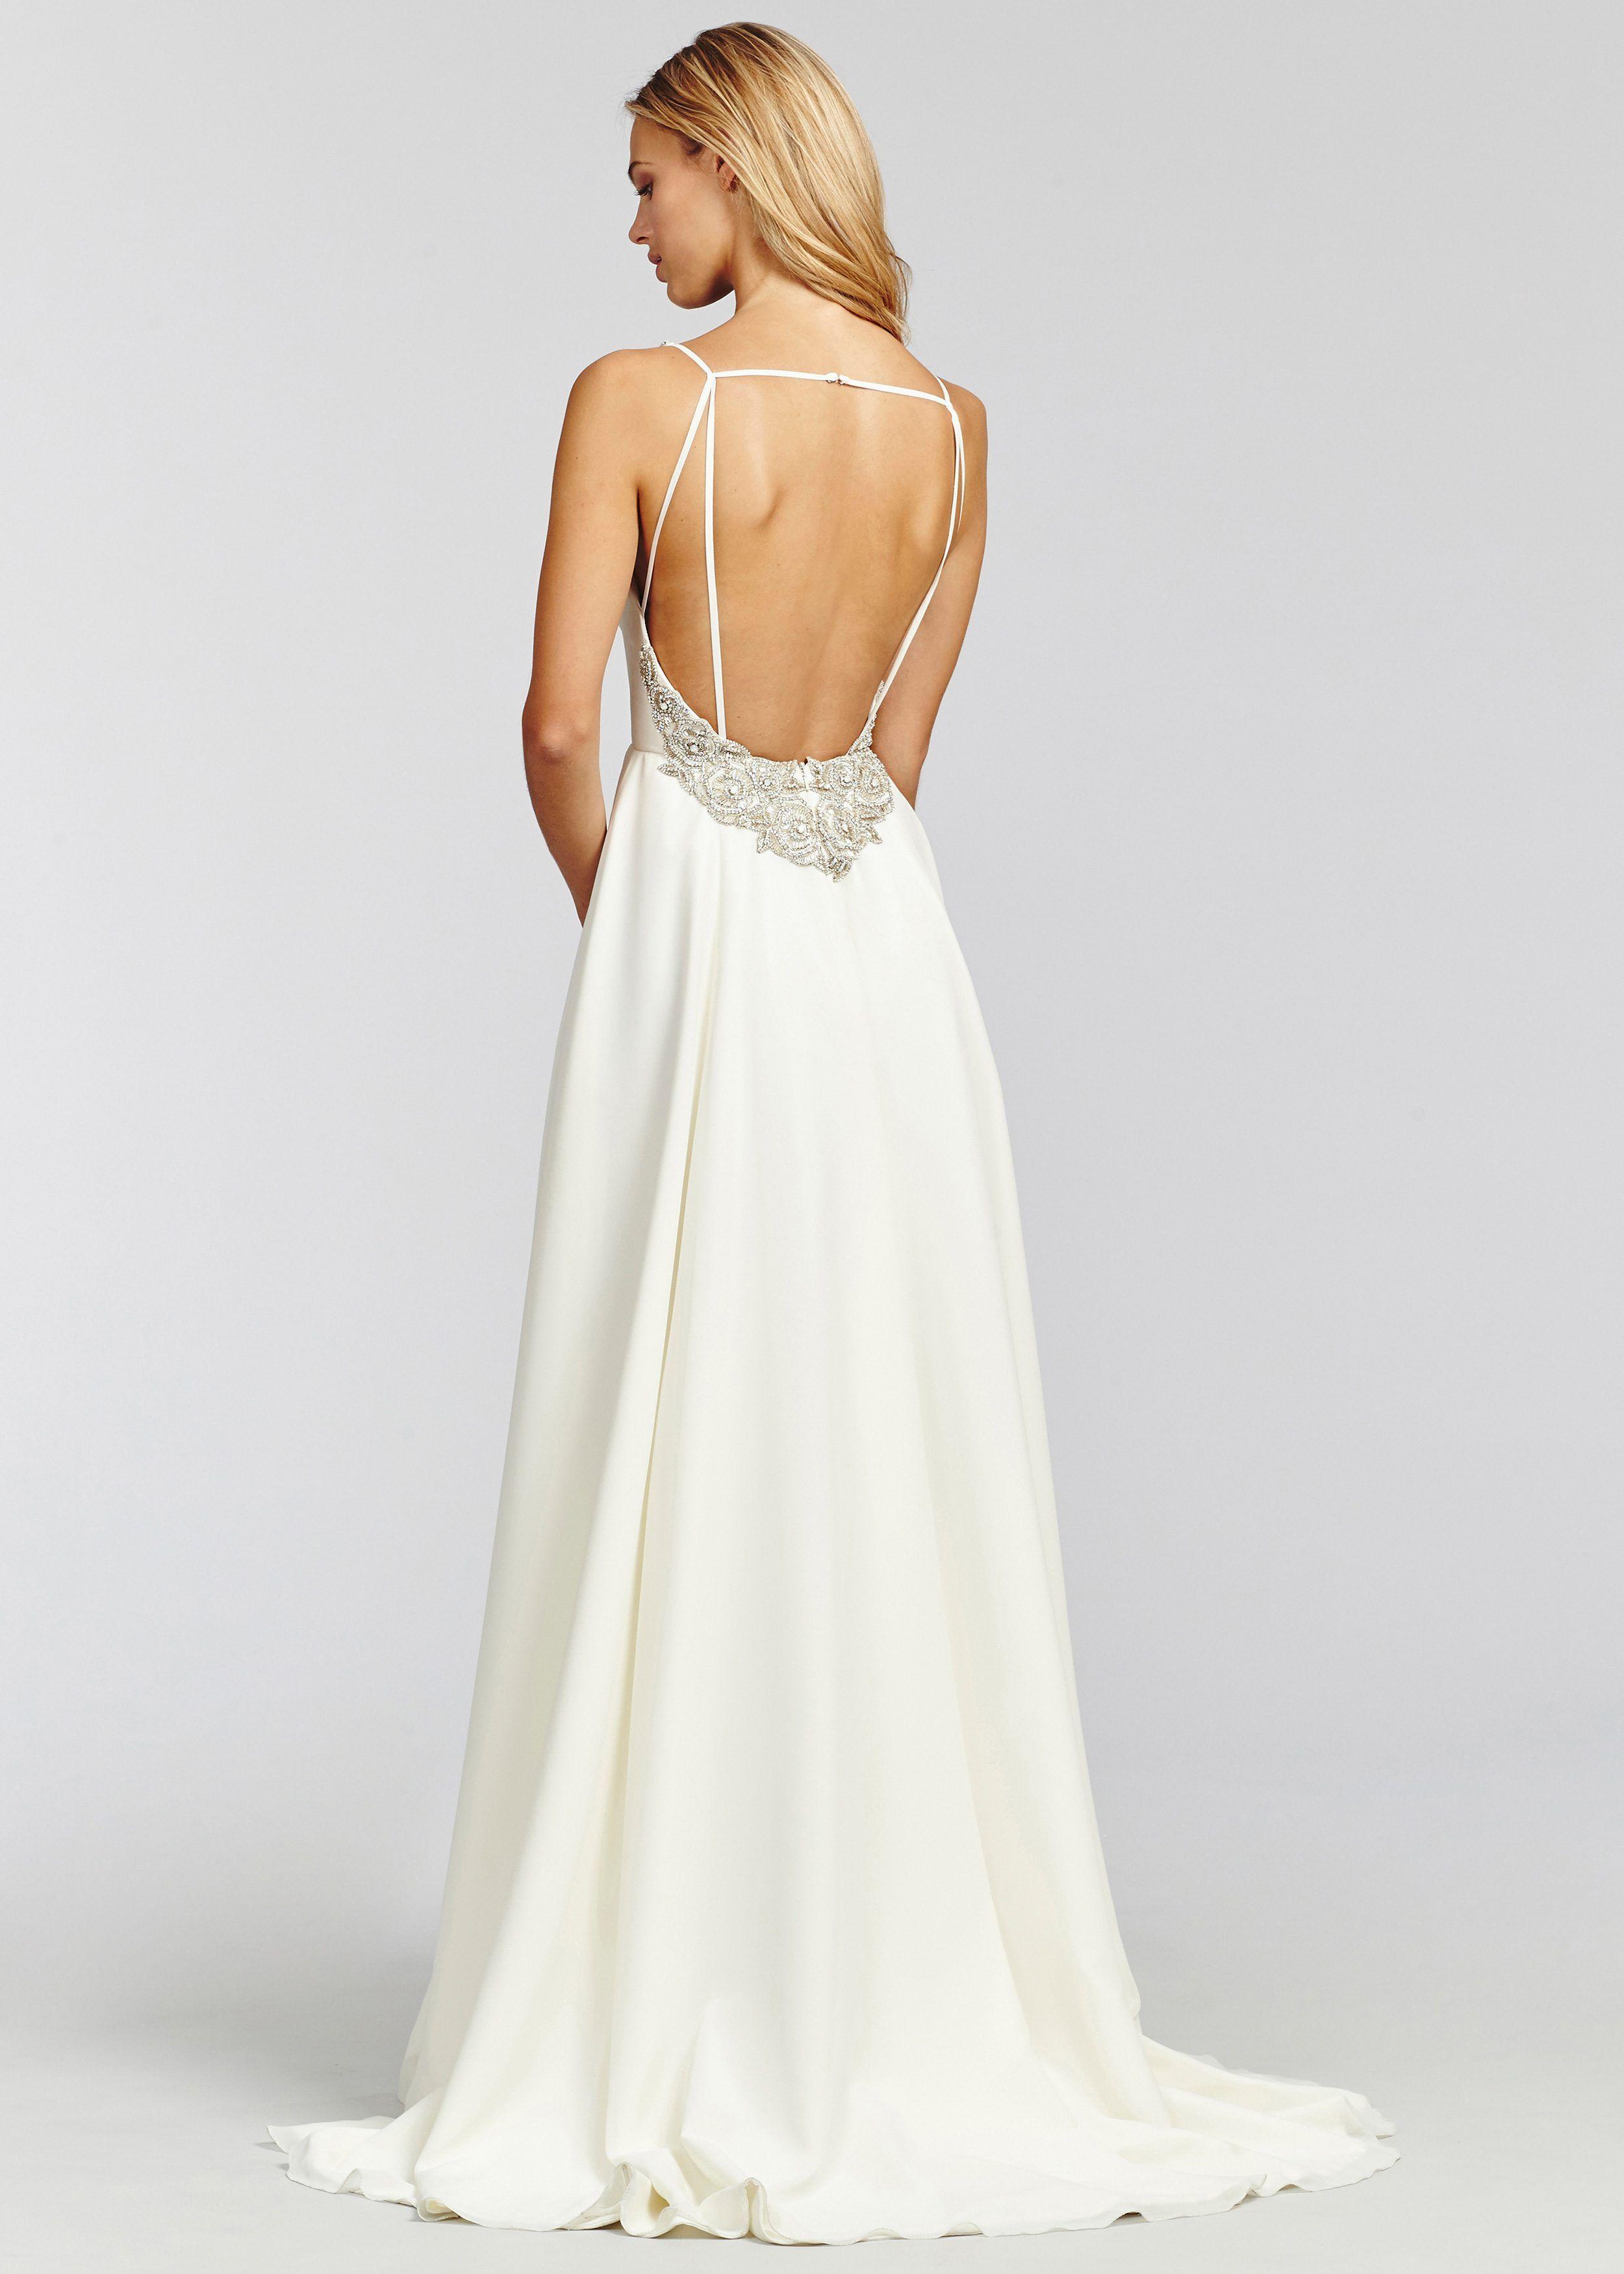 12+ Sample wedding dresses near me info